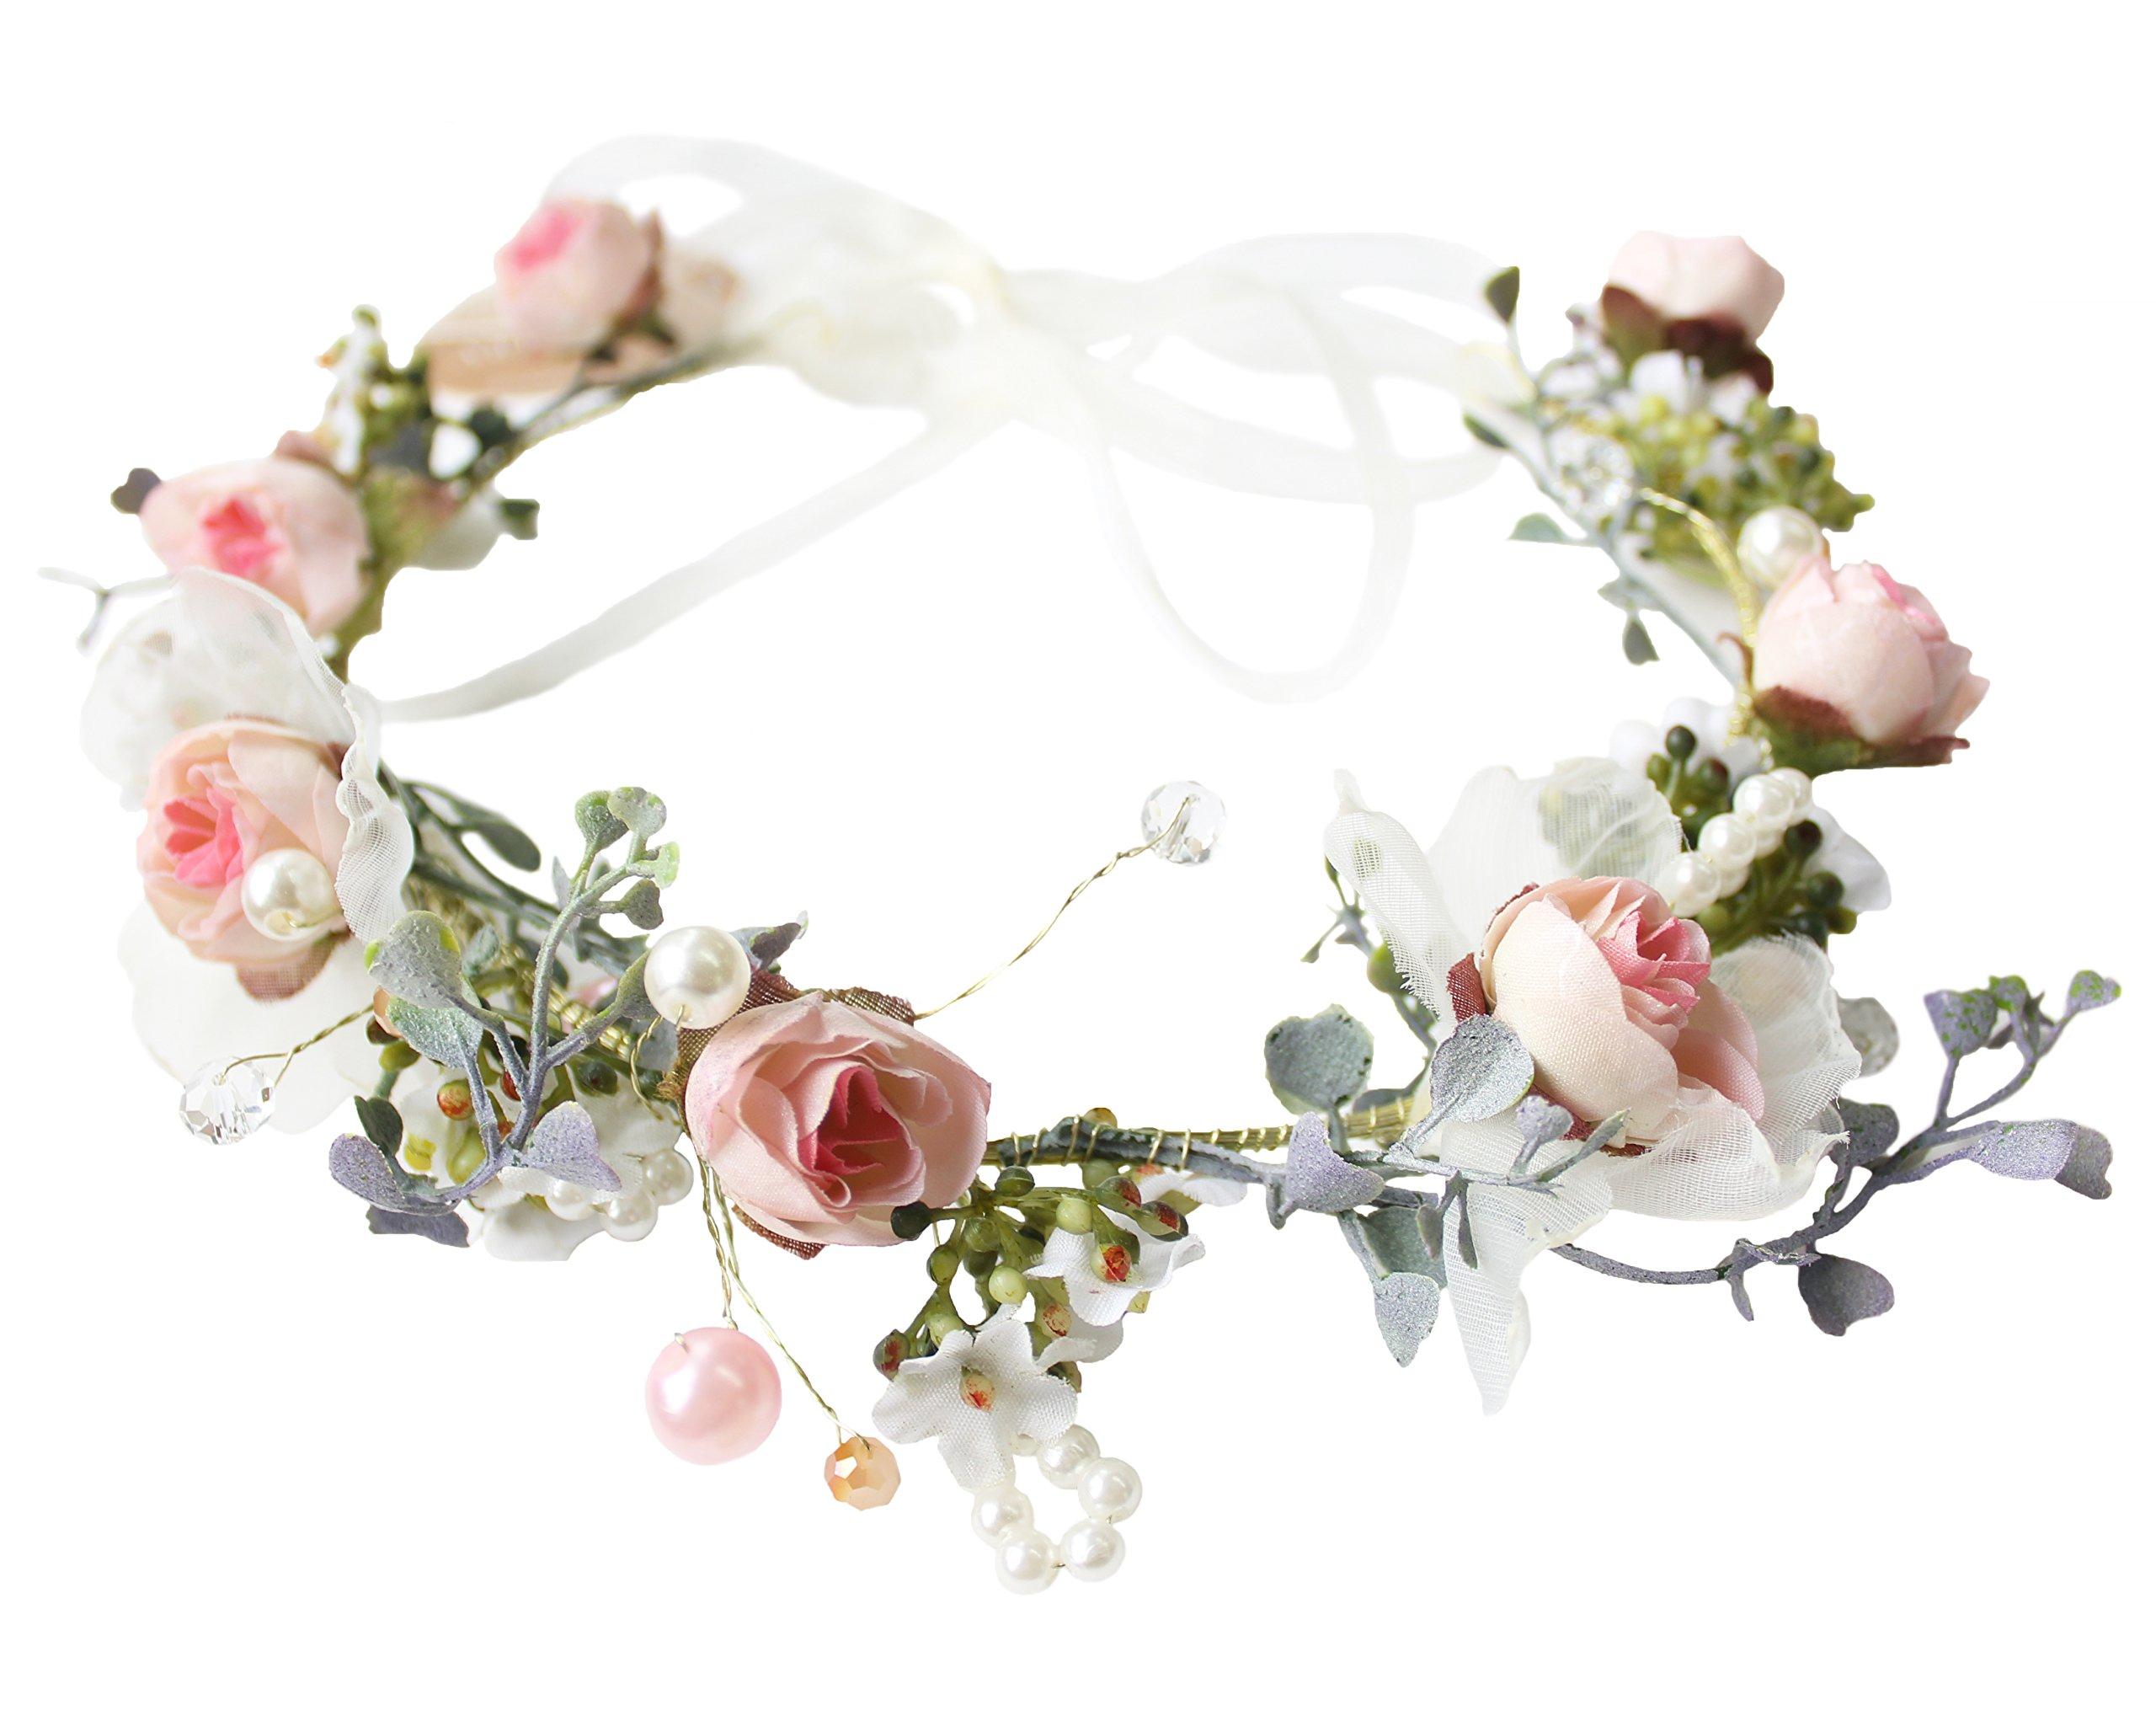 Vivivalue Pearl Flower Crown Floral Garland Headband Flower Halo Headpiece Hair Wreath Boho with Ribbon Party Wedding Festival Photos Pink